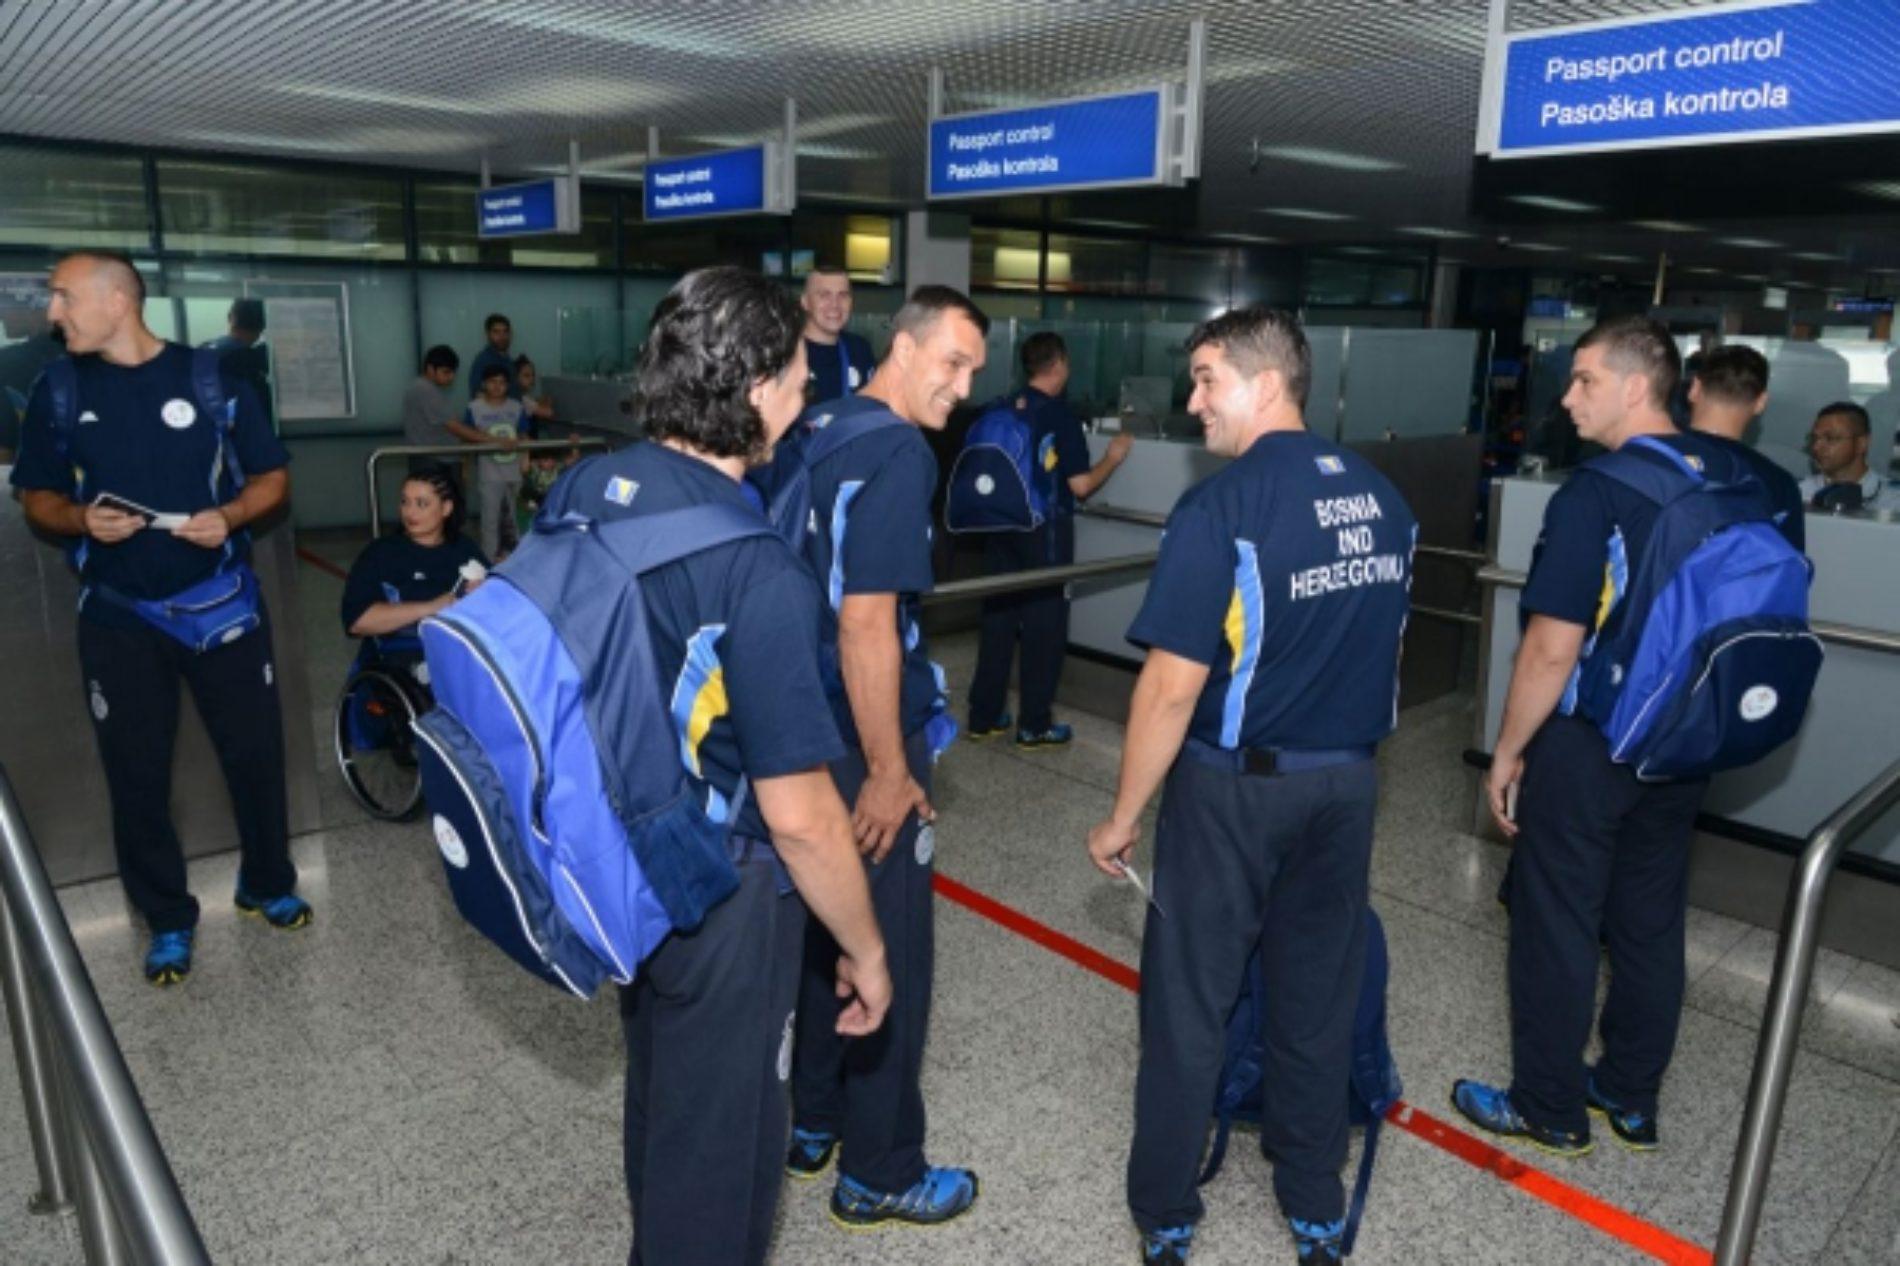 Bh. paraolimpijci otputovali u Rio